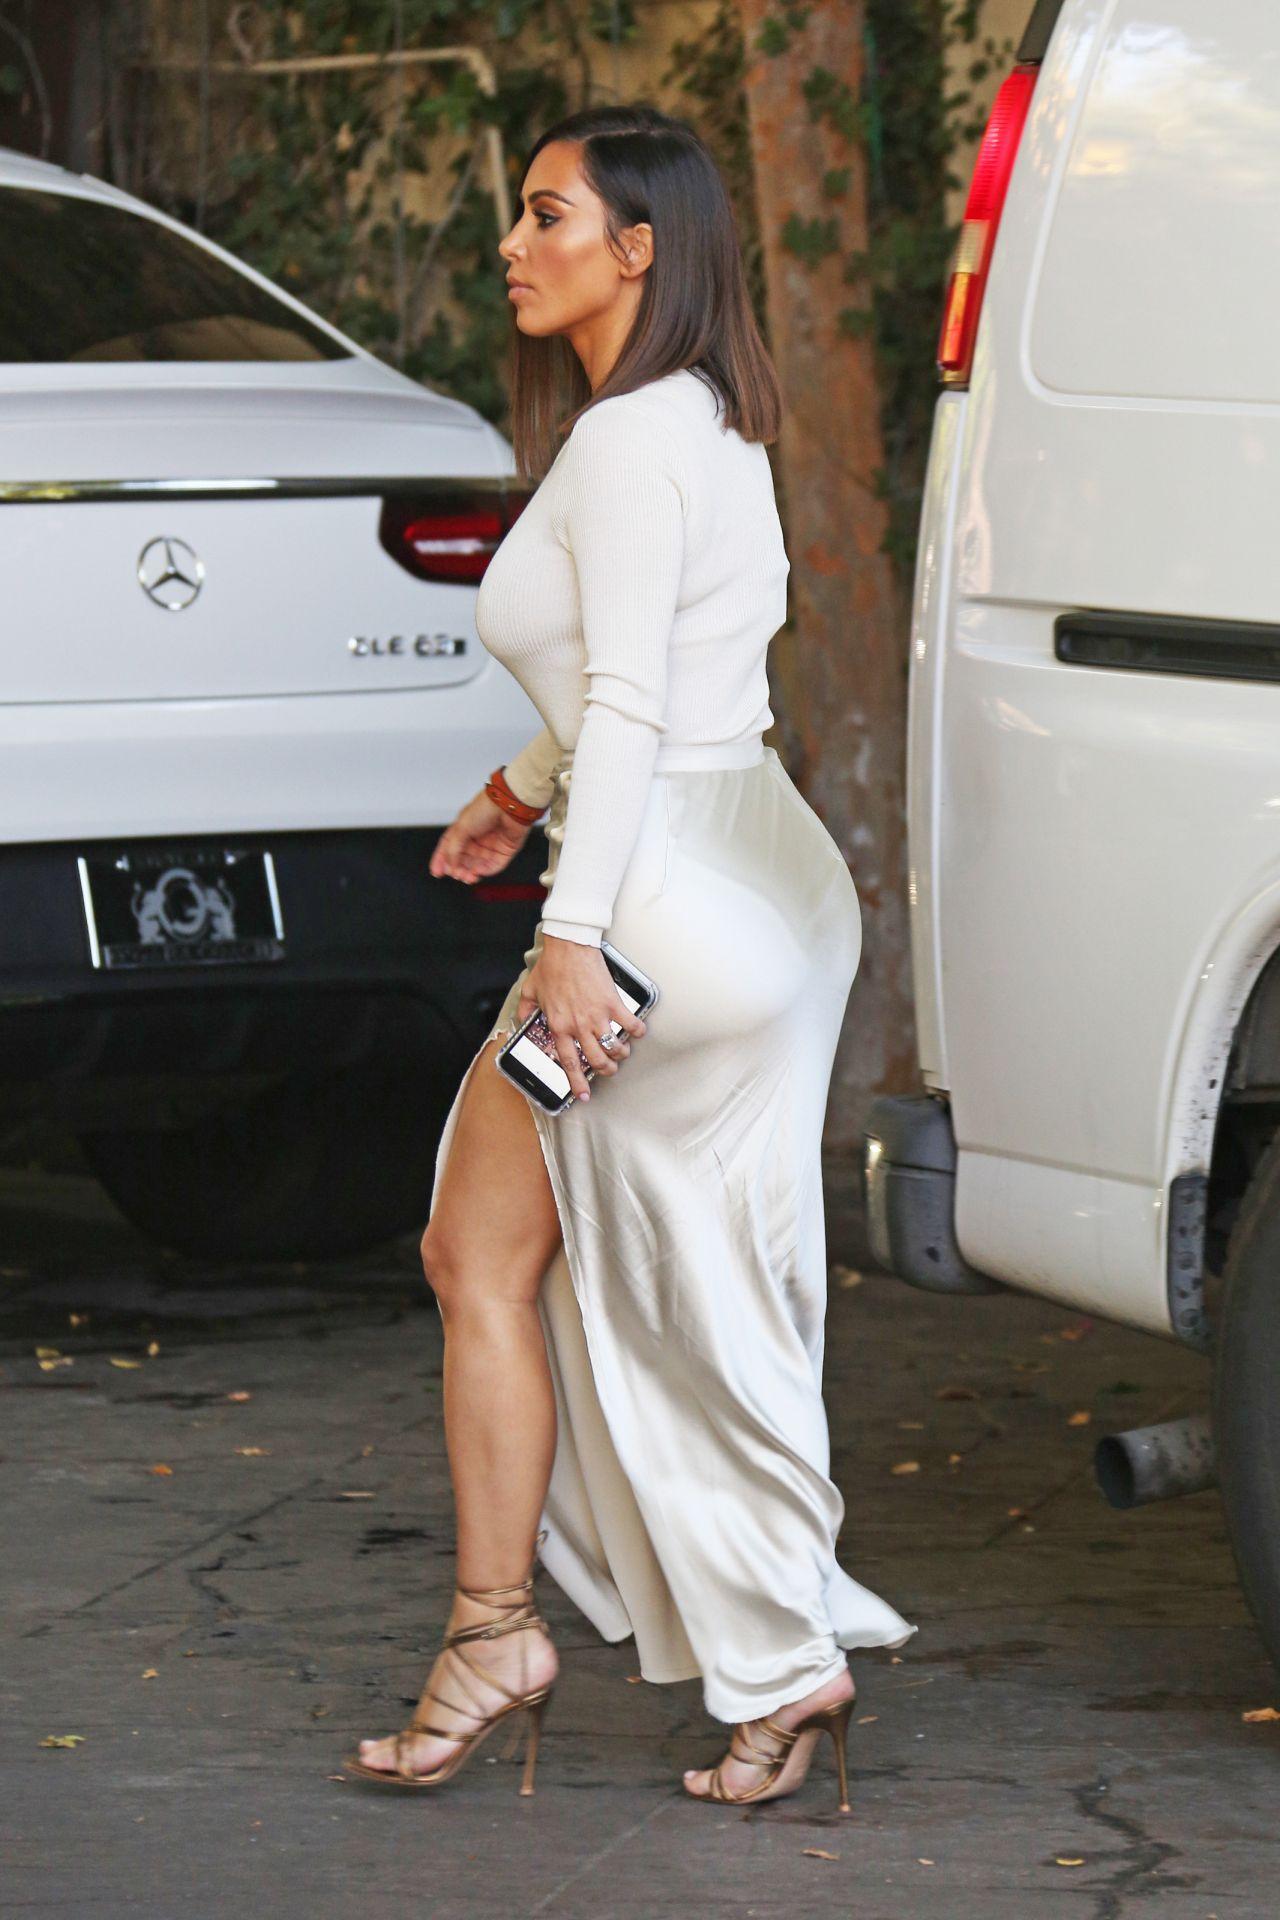 Kim Kardashian Classy Fashion At The Villa Restaurant In Woodland Hills August 2016